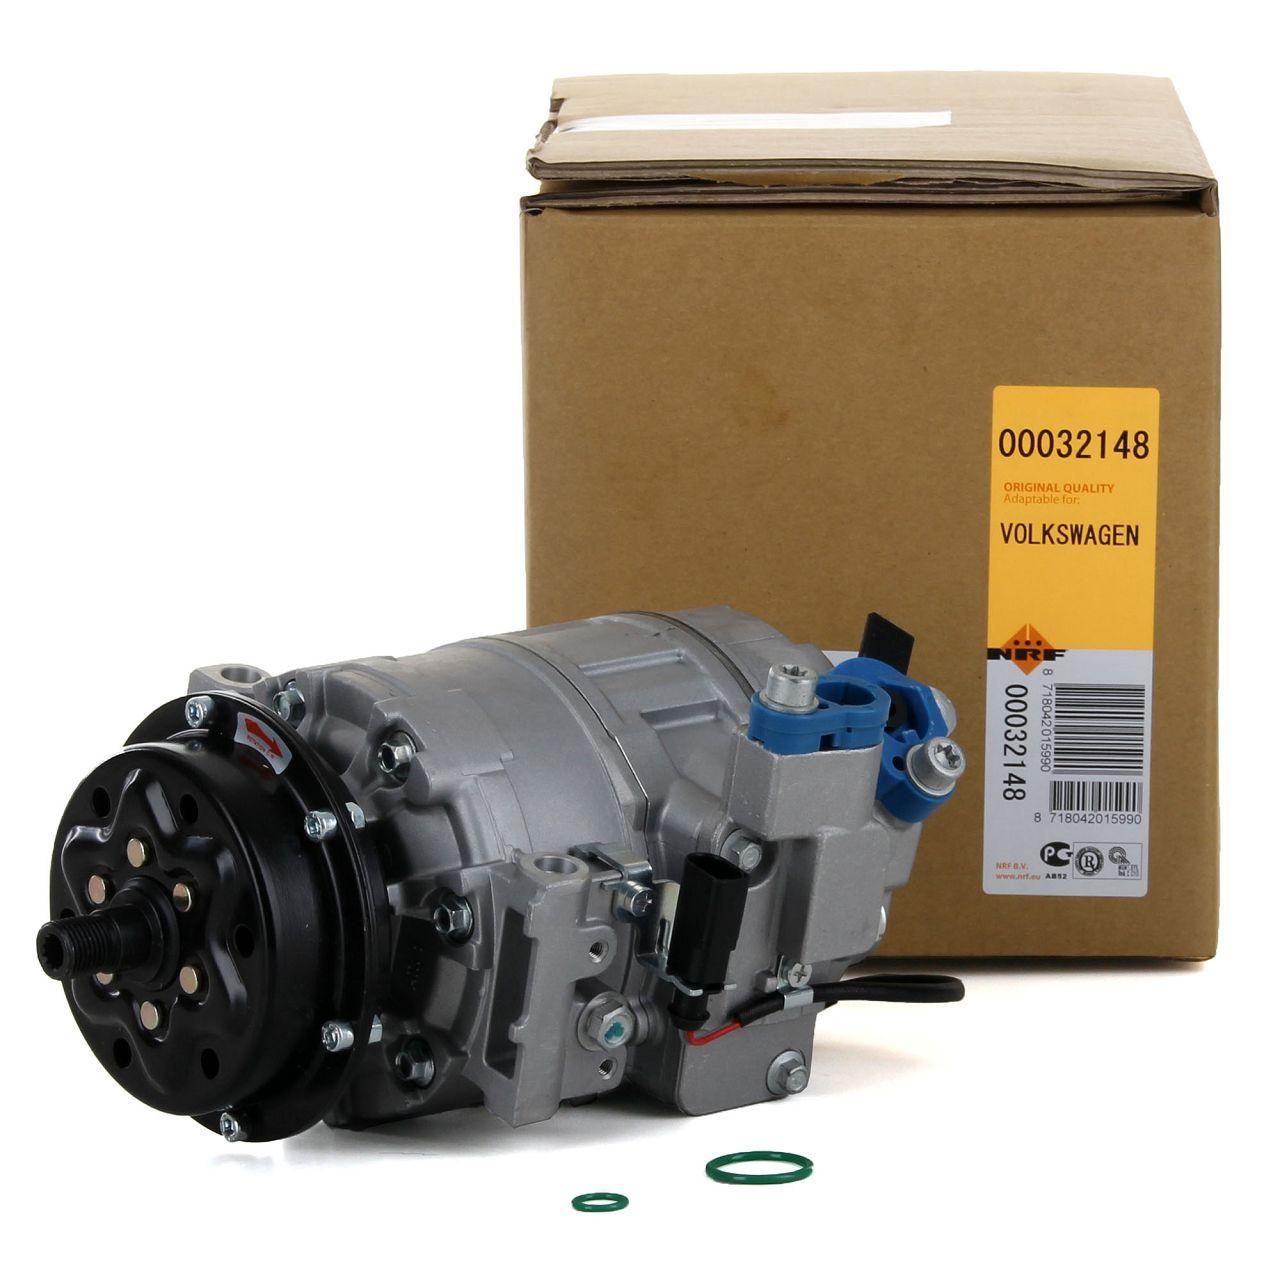 NRF 32148 Kompressor Klimaanlage EASY FIT für VW PHAETON T5 TOUAREG (7L) 2.5 TDI